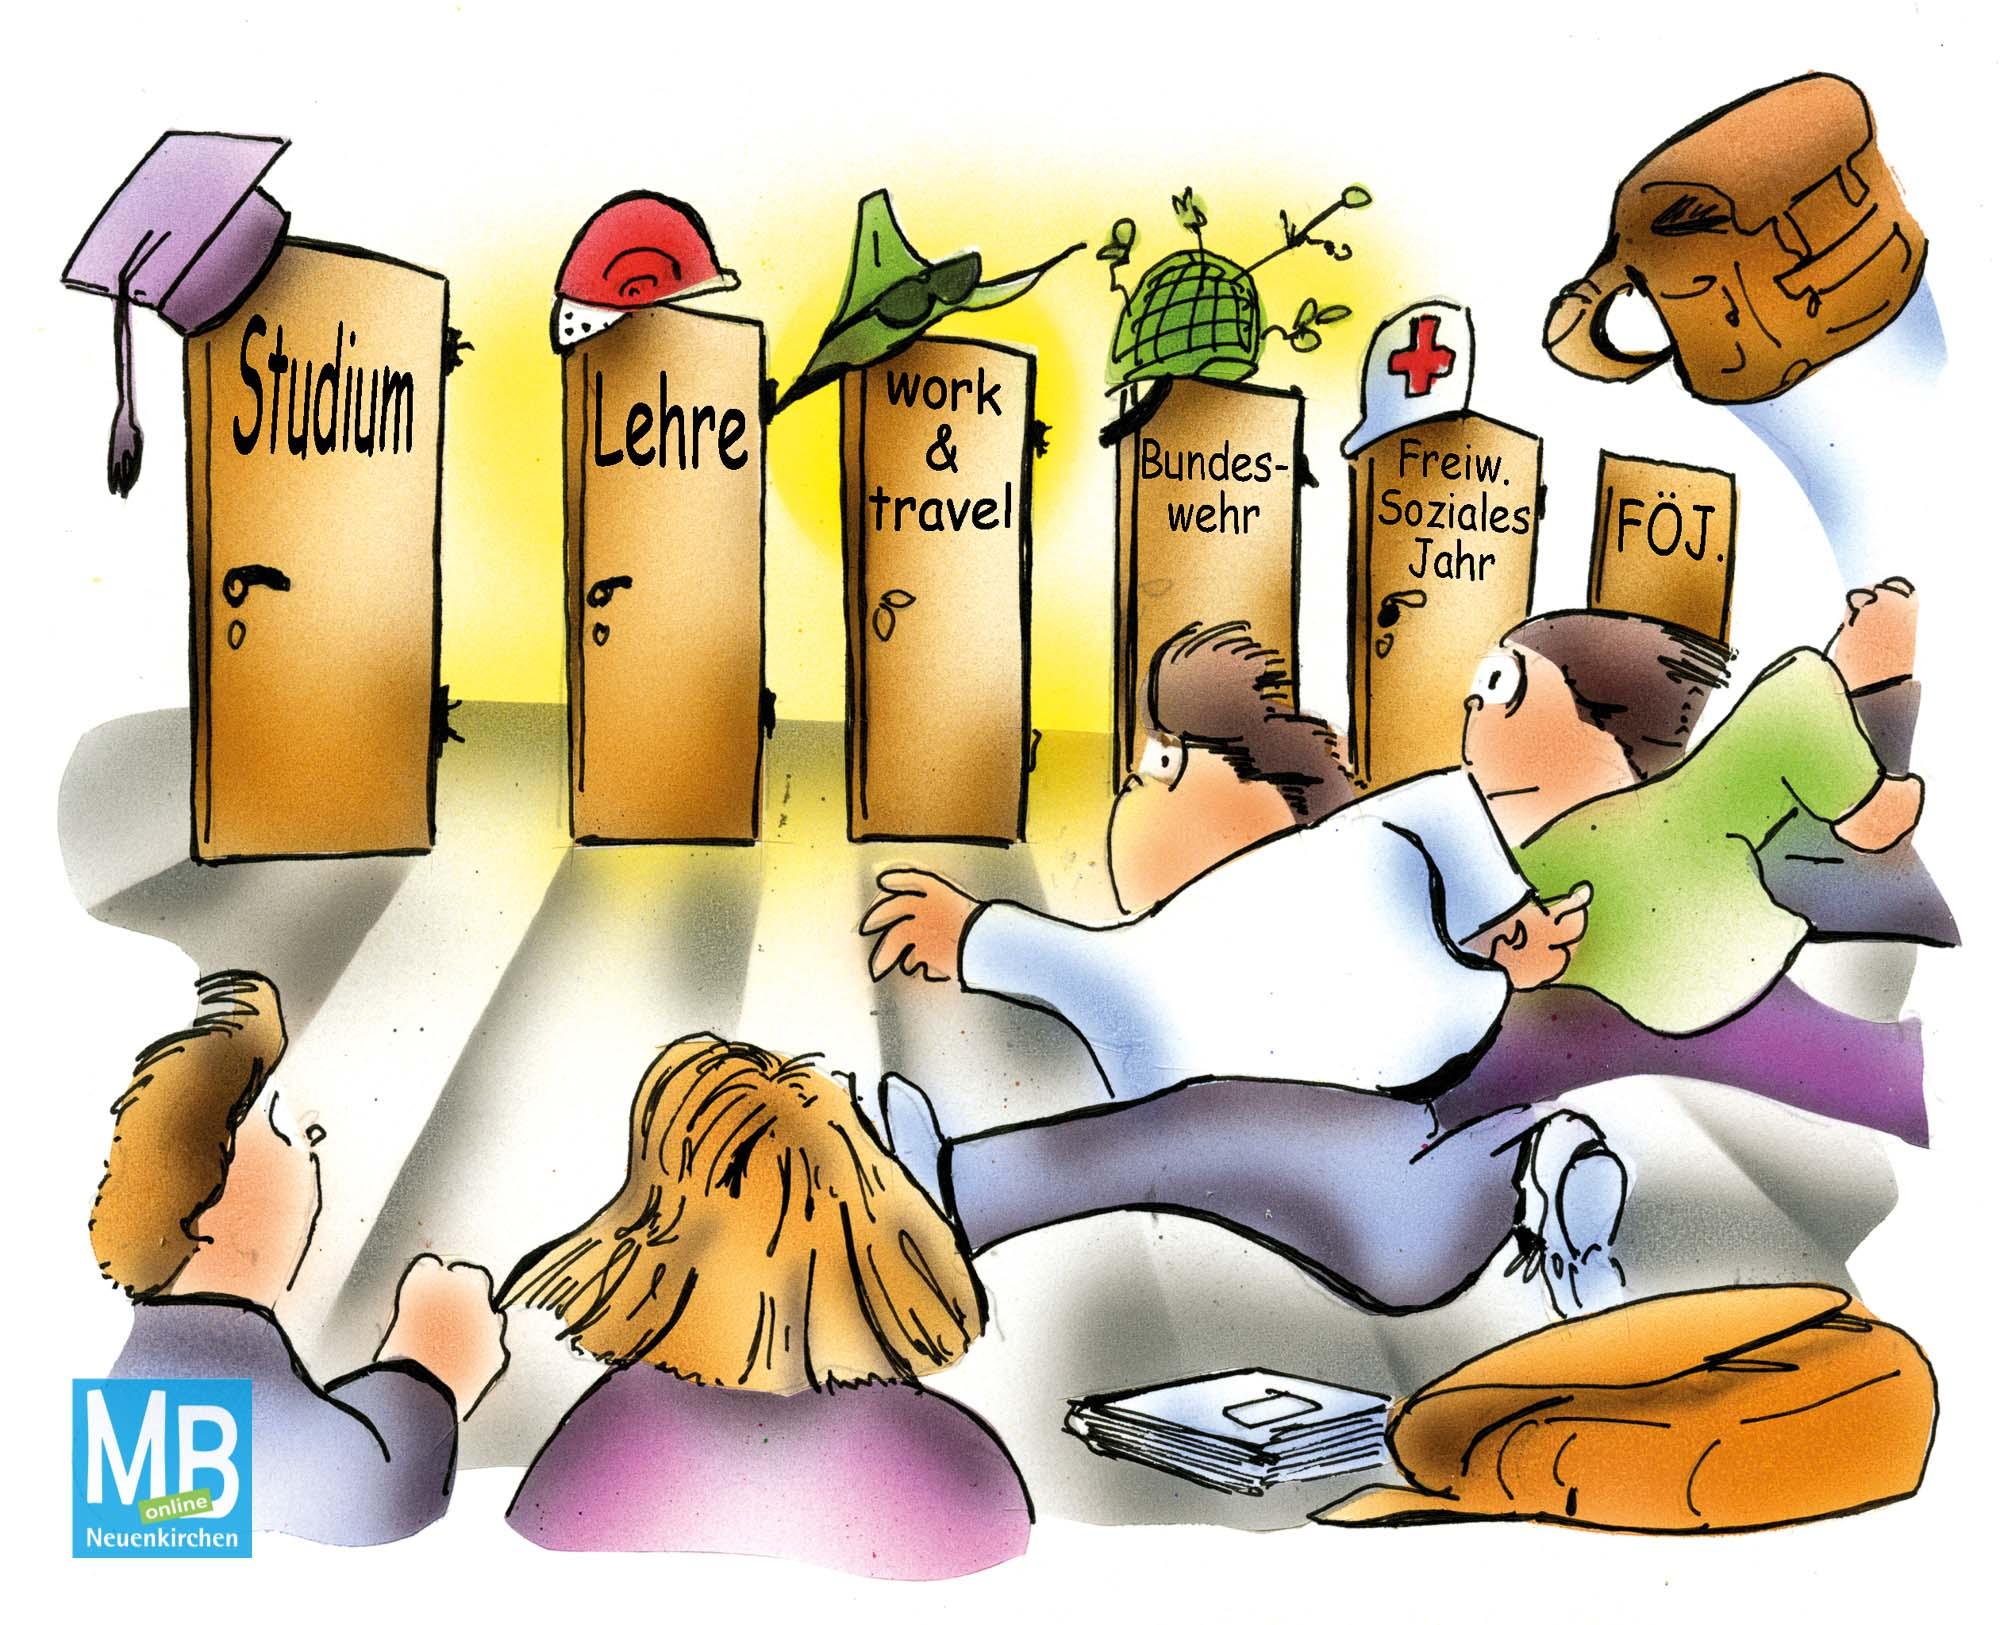 Karikatur: H. Schwarze-Blanke, HSB-Cartoon